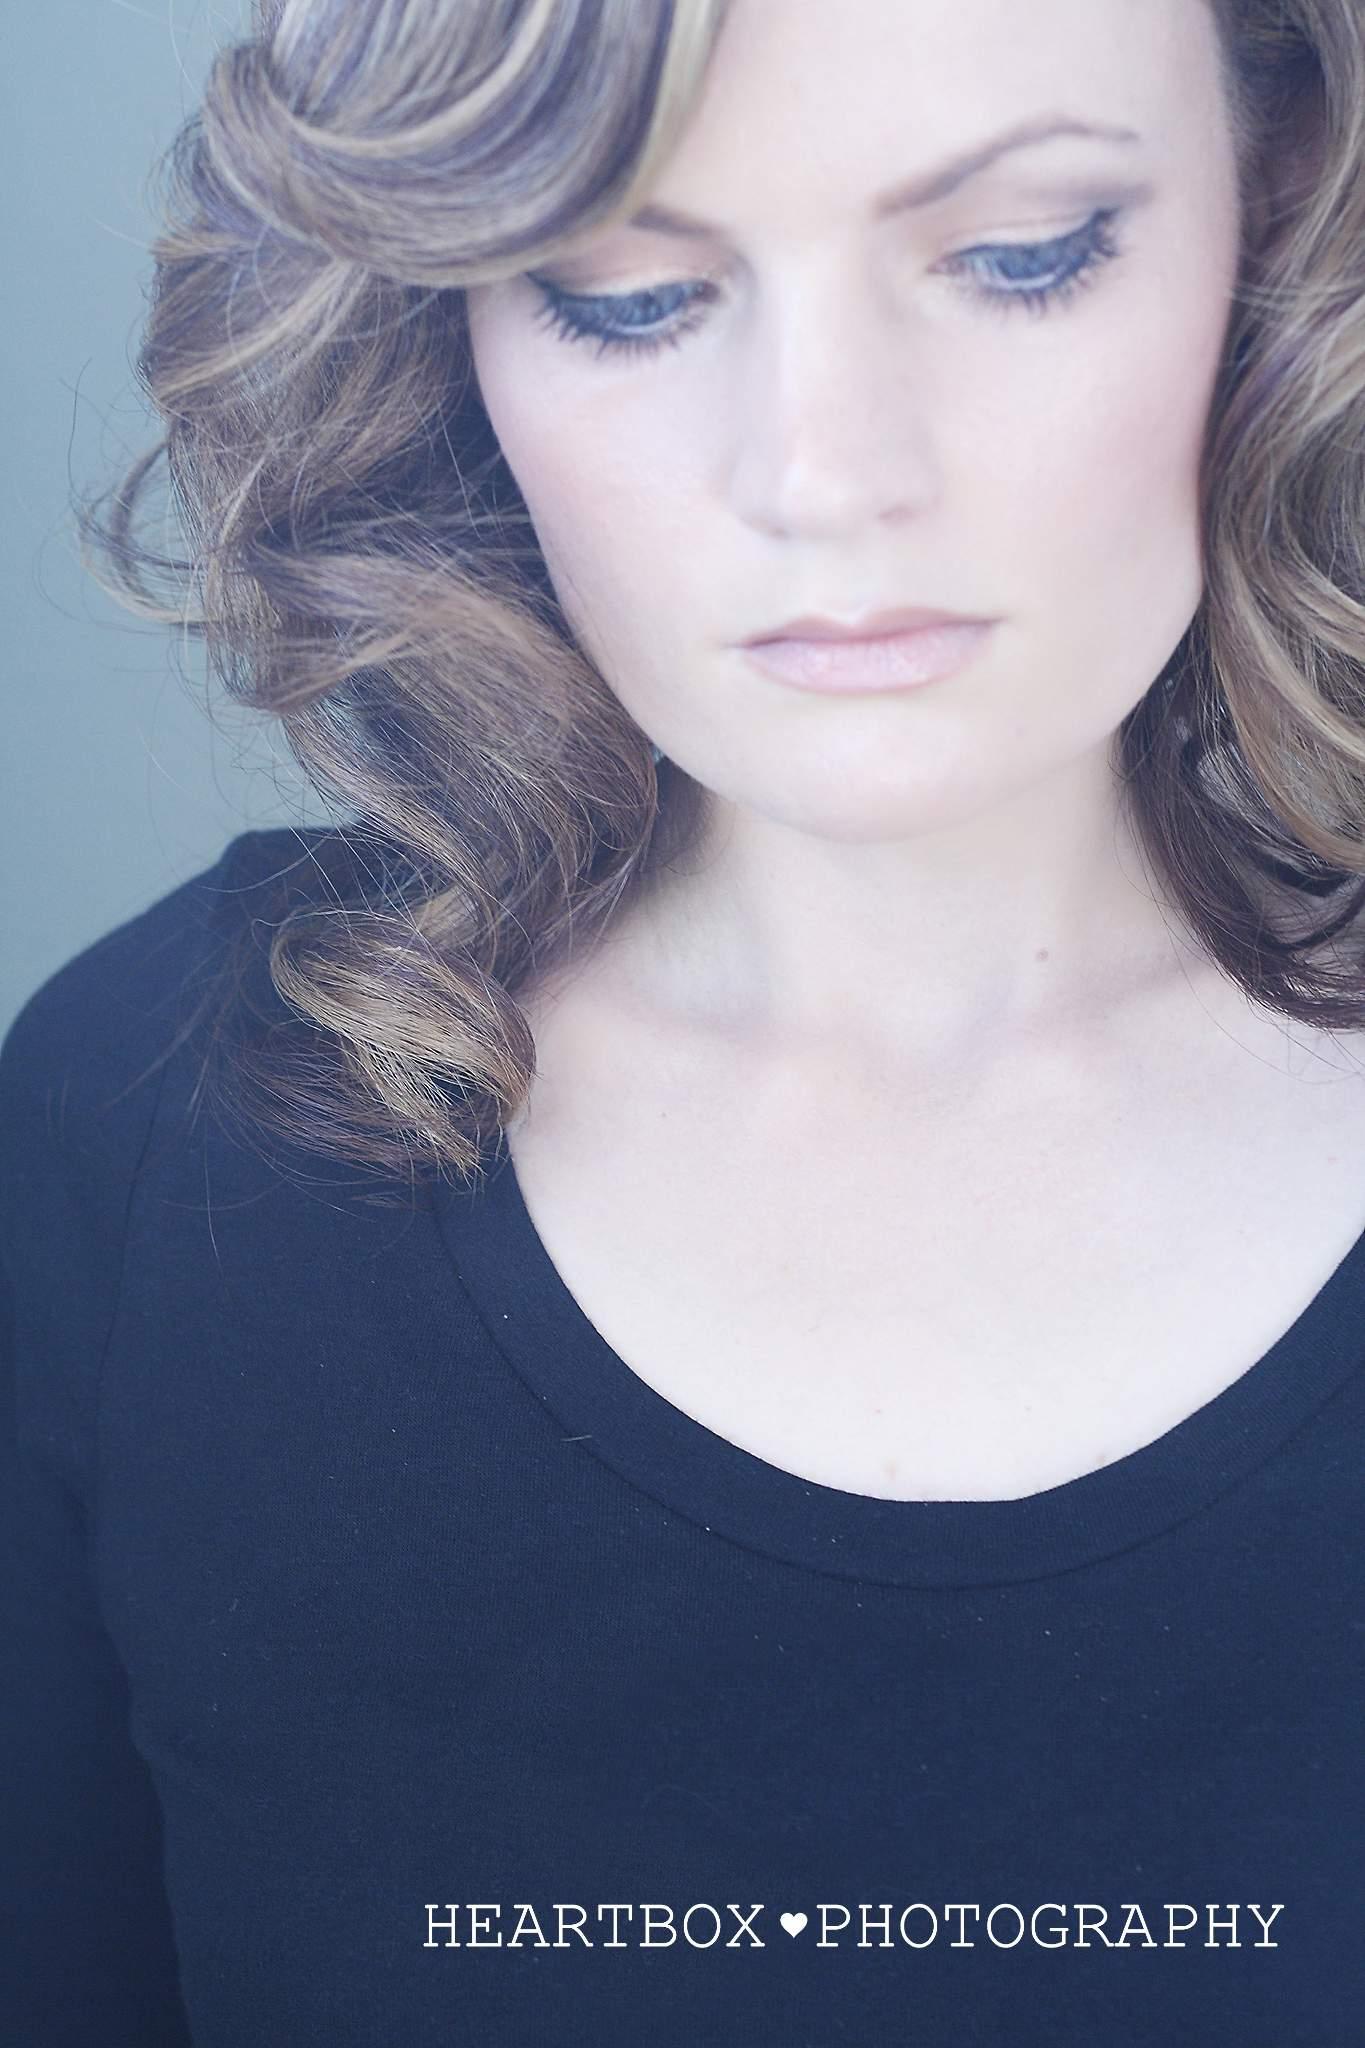 Image |   Heartbox Photography    Hair/makeup | Julieta Camacho